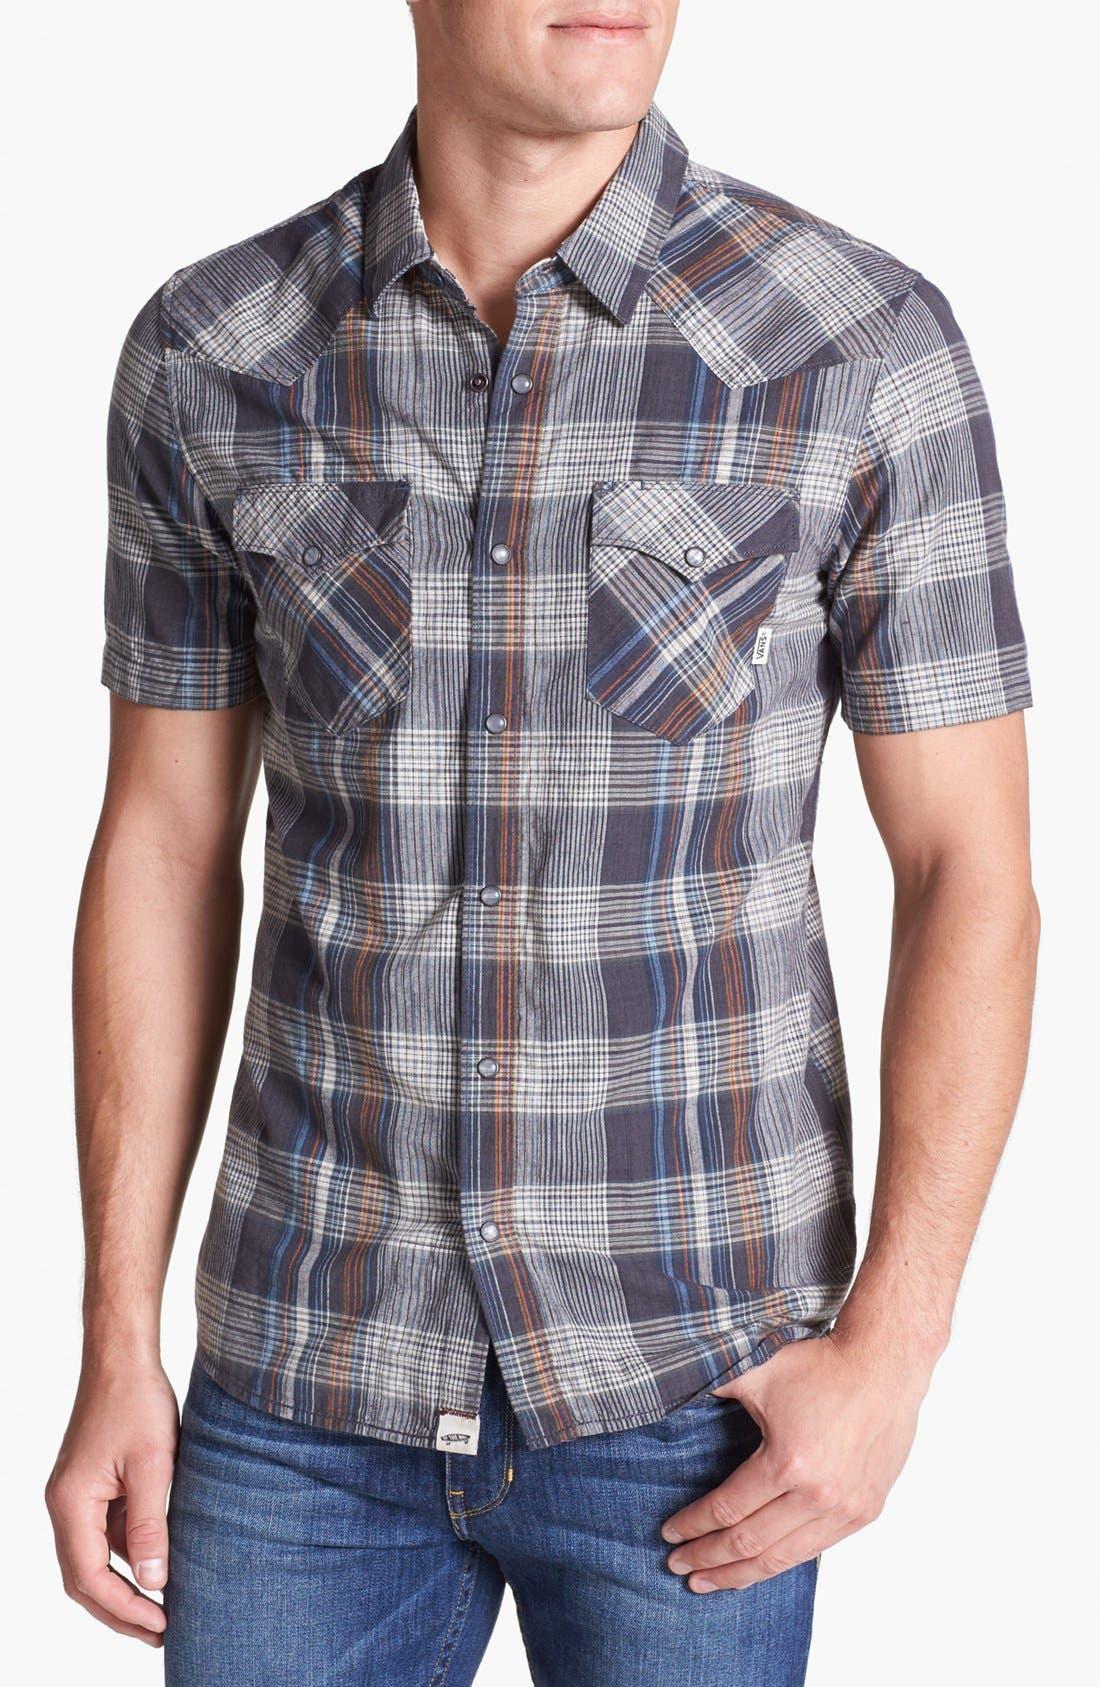 Alternate Image 1 Selected - Vans 'Windsor' Plaid Woven Shirt